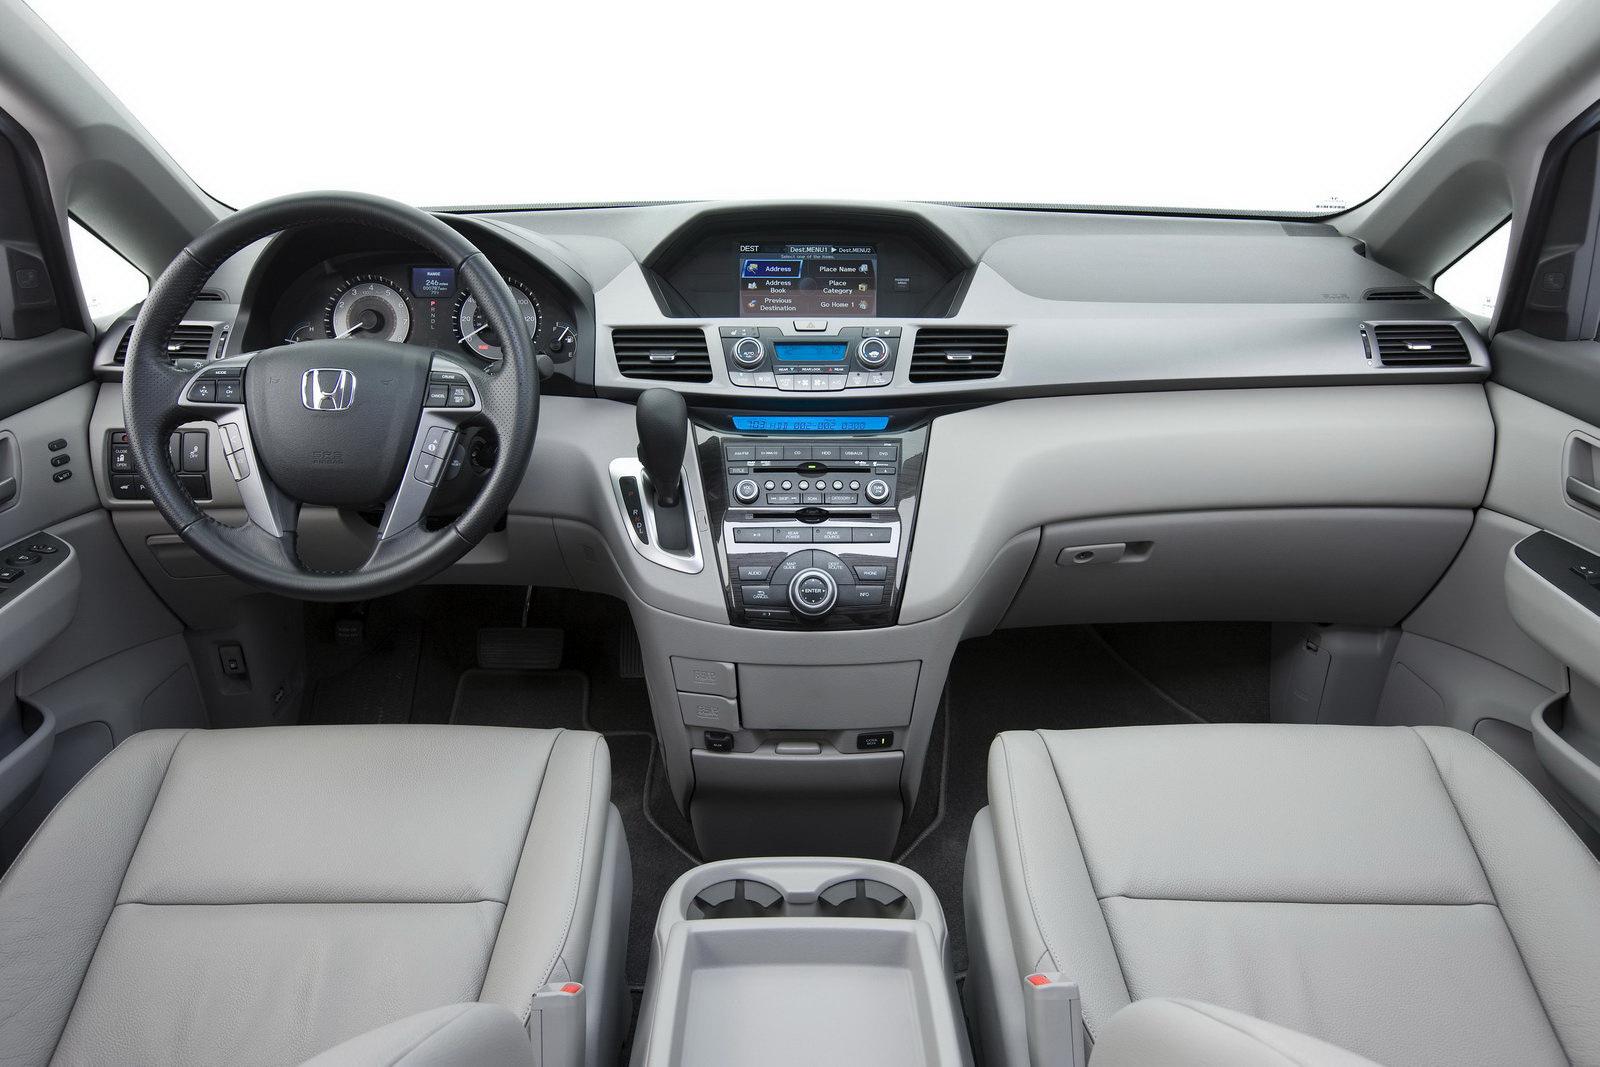 2011 Honda Odyssey Minivan Officially Revealed 45 Photos